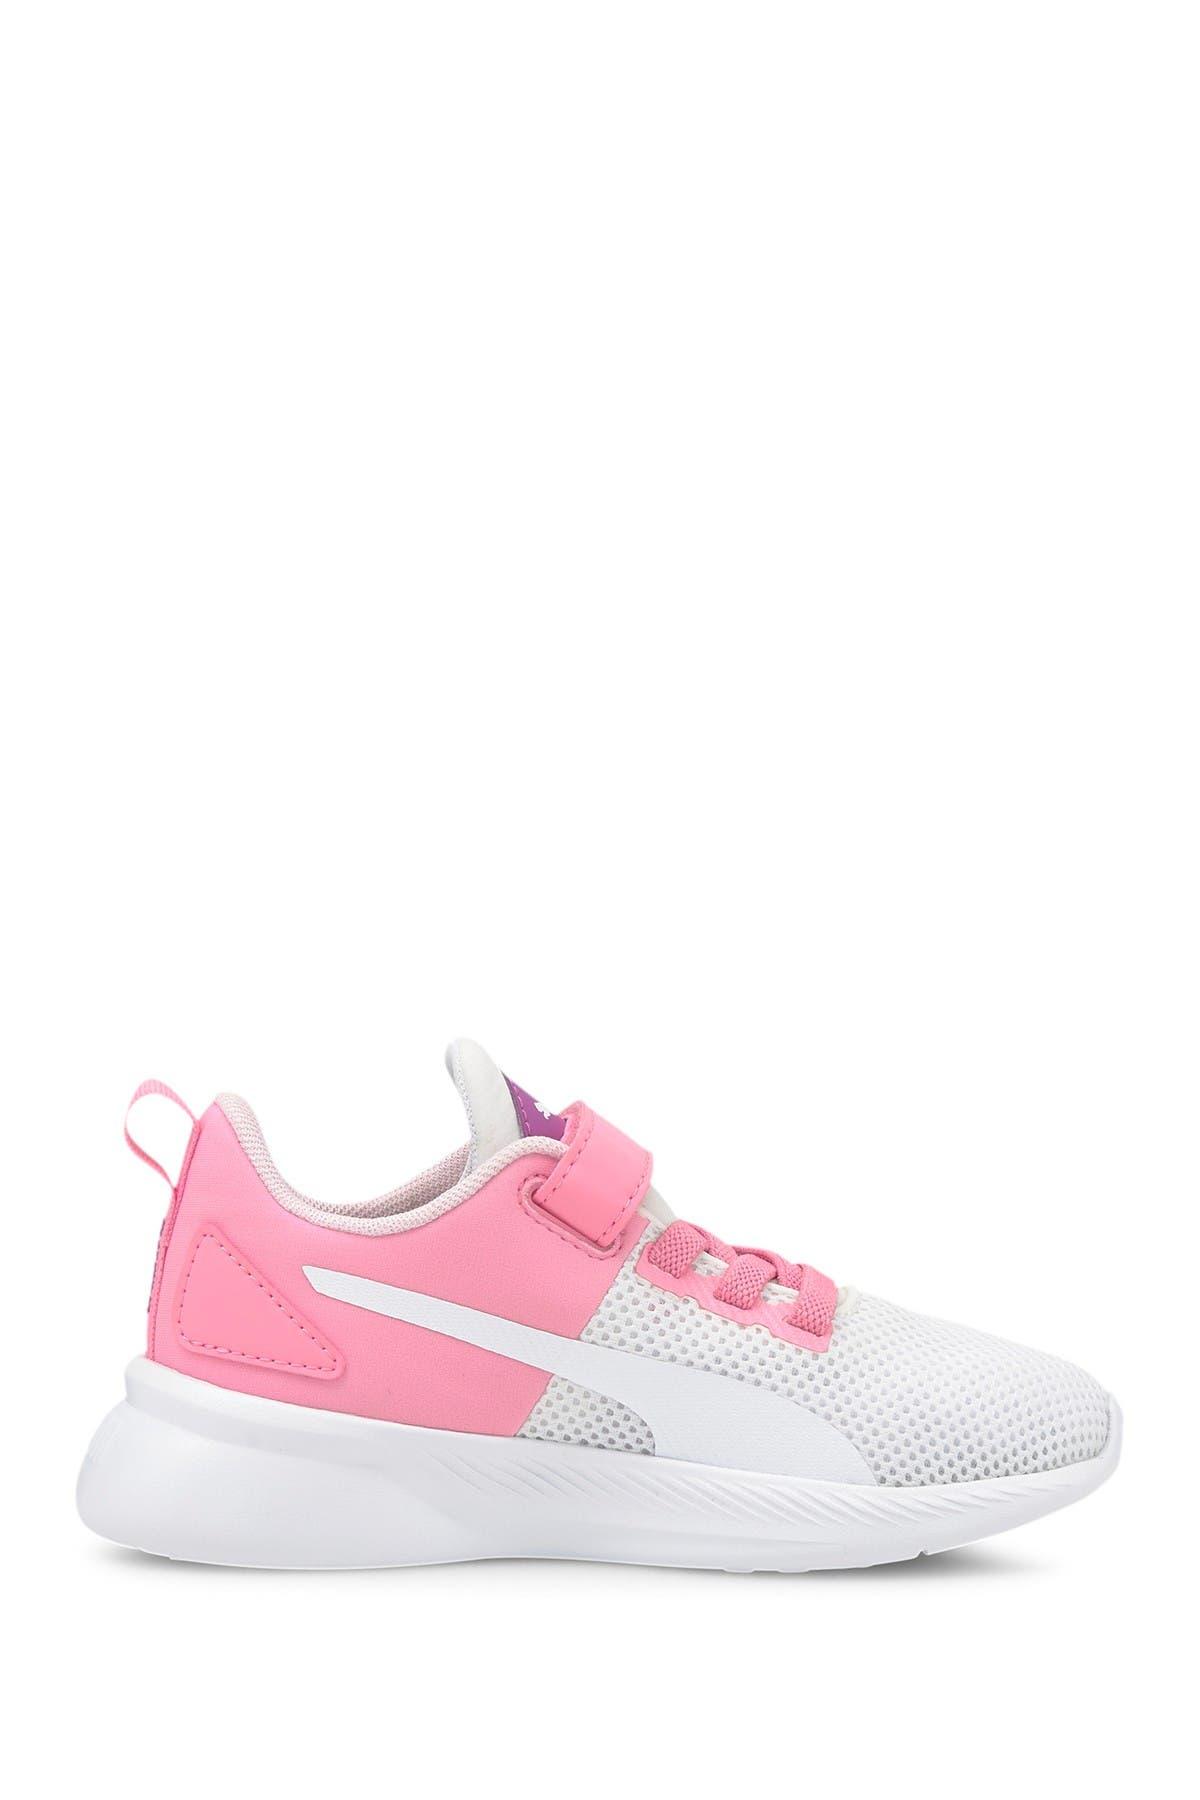 Image of PUMA Flyer Runner Color Twist Sneaker